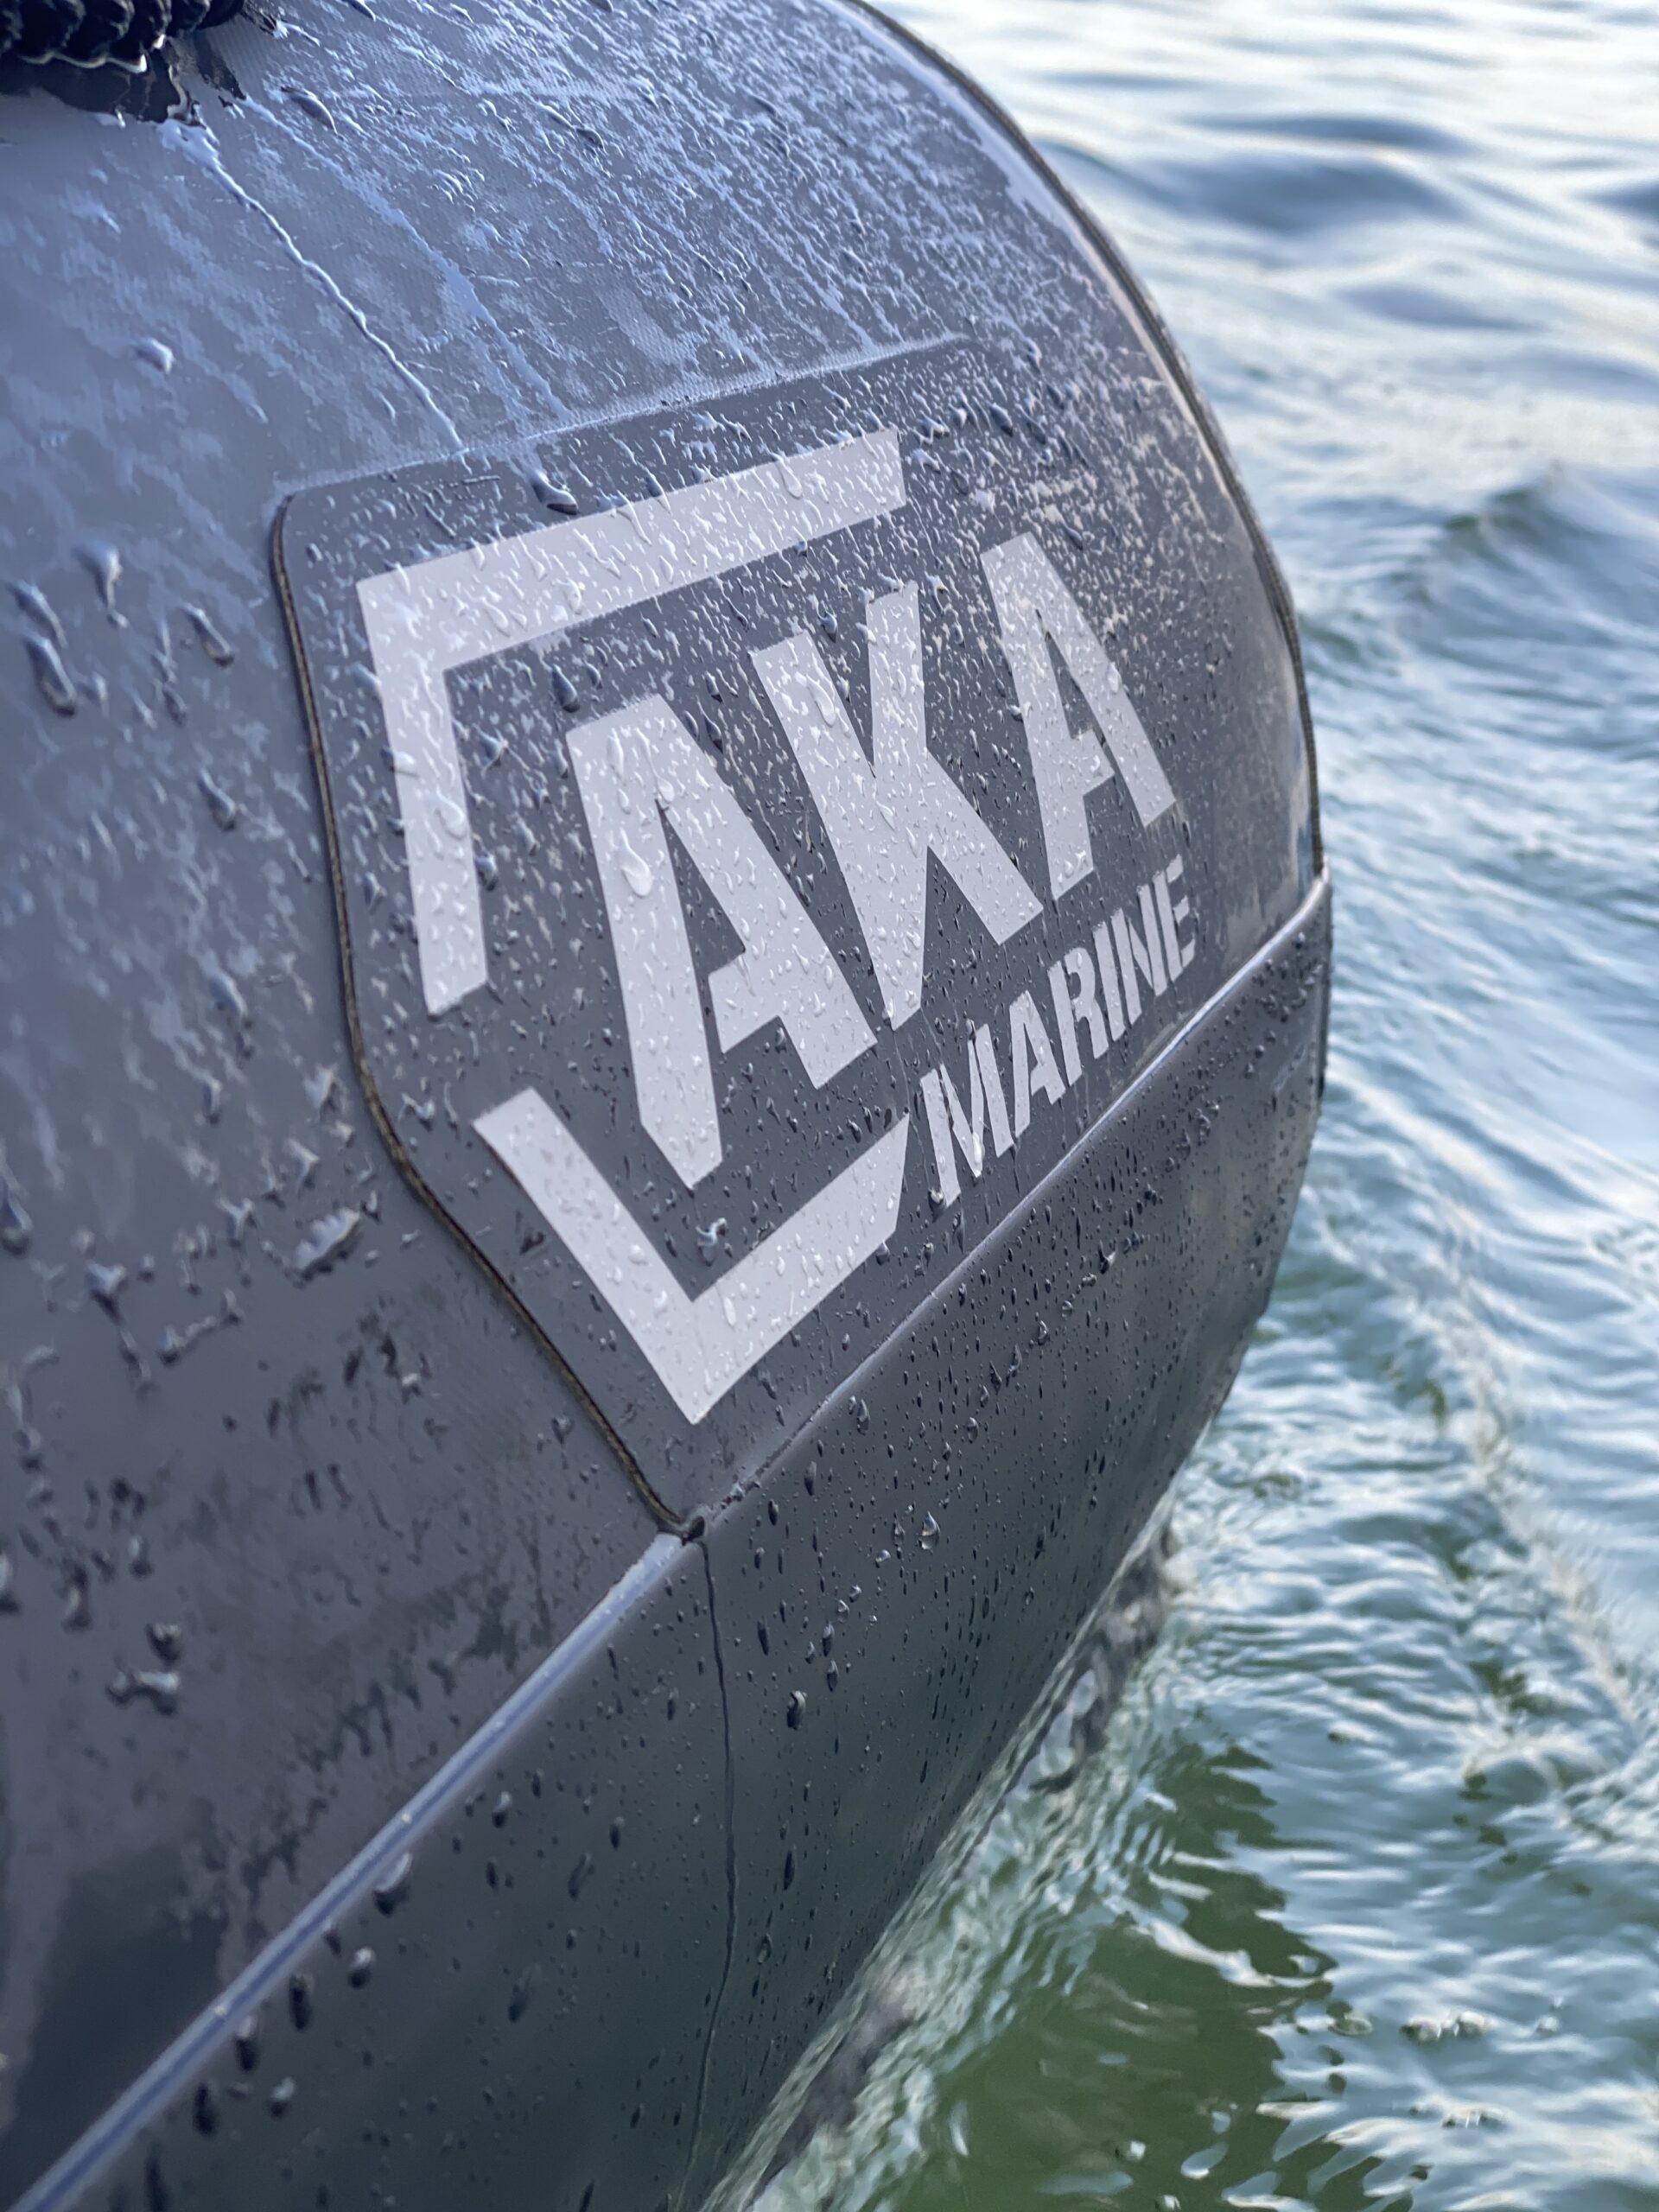 zodiac-akamarine-f47h-c-foldable-workboat-werkboot-nederland-aalsmeer-heavy-duty-milpro-1